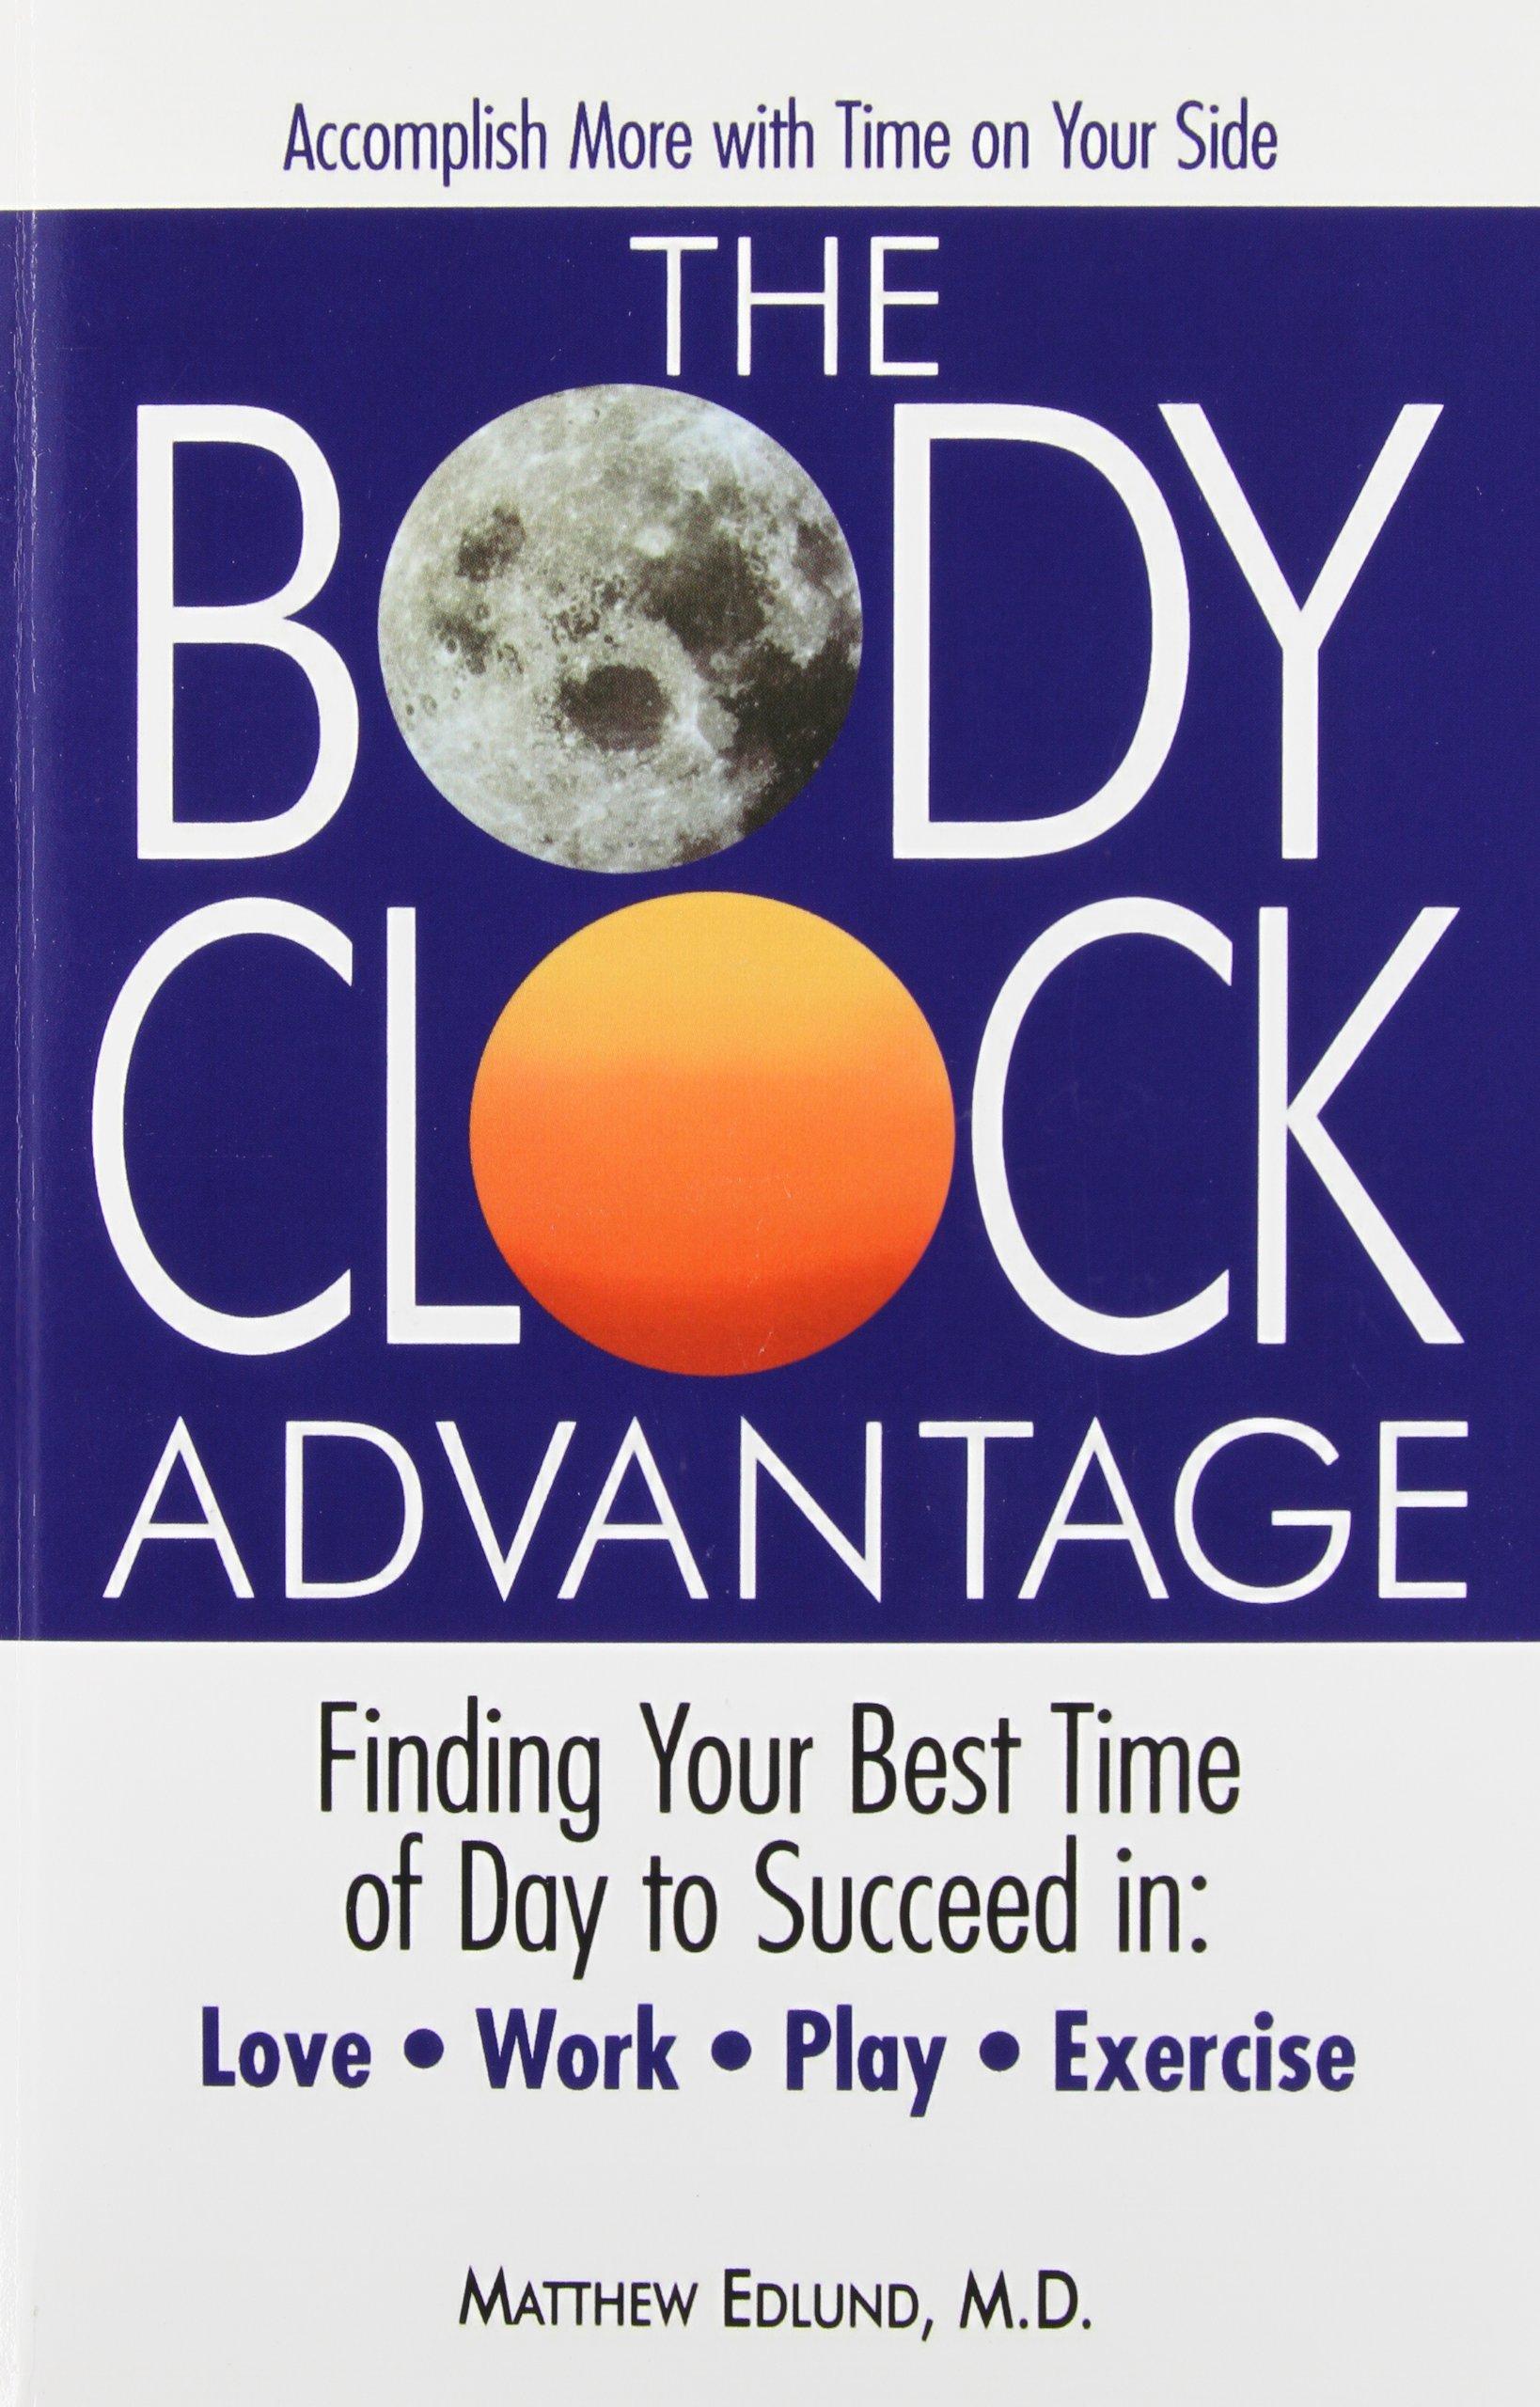 The Body Clock Advantage: Matthew Edlund: 9780974892702: Amazon.com: Books